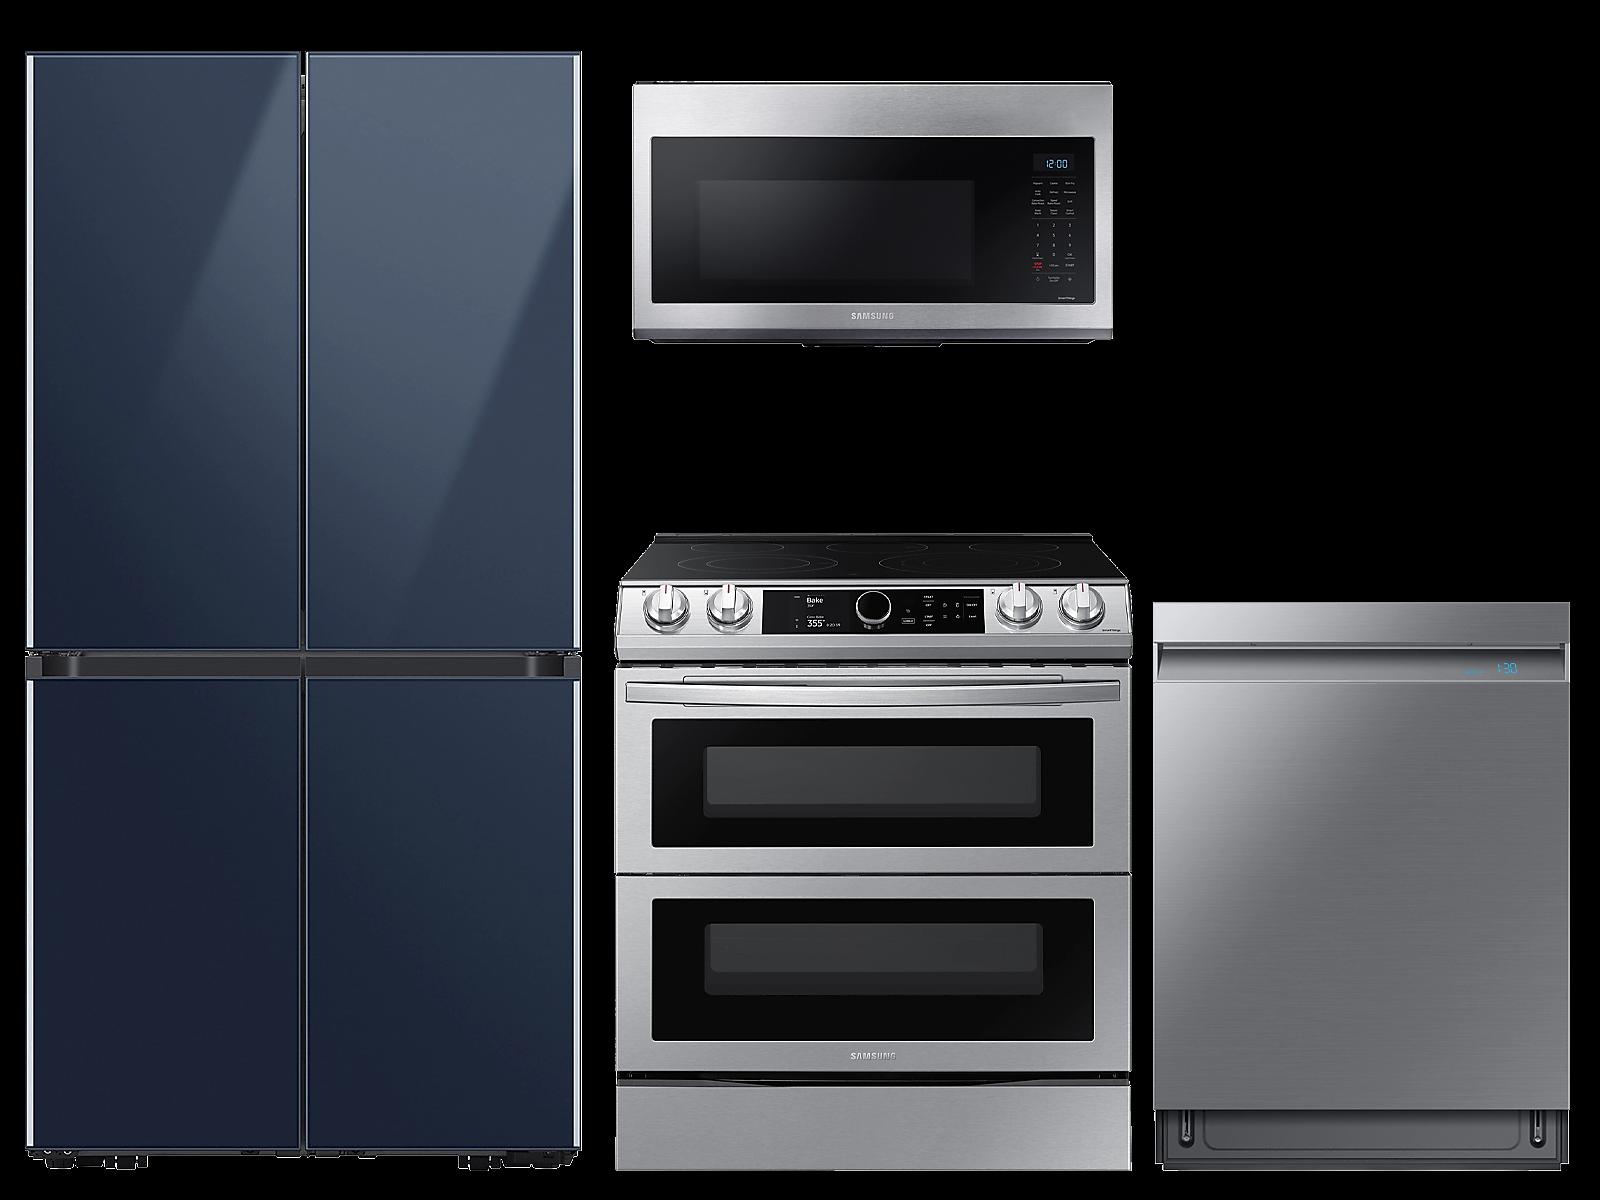 Samsung coupon: Samsung 29 cu. ft. Full Depth BESPOKE 4-Door FlexTM Refrigerator in Navy Blue Glass